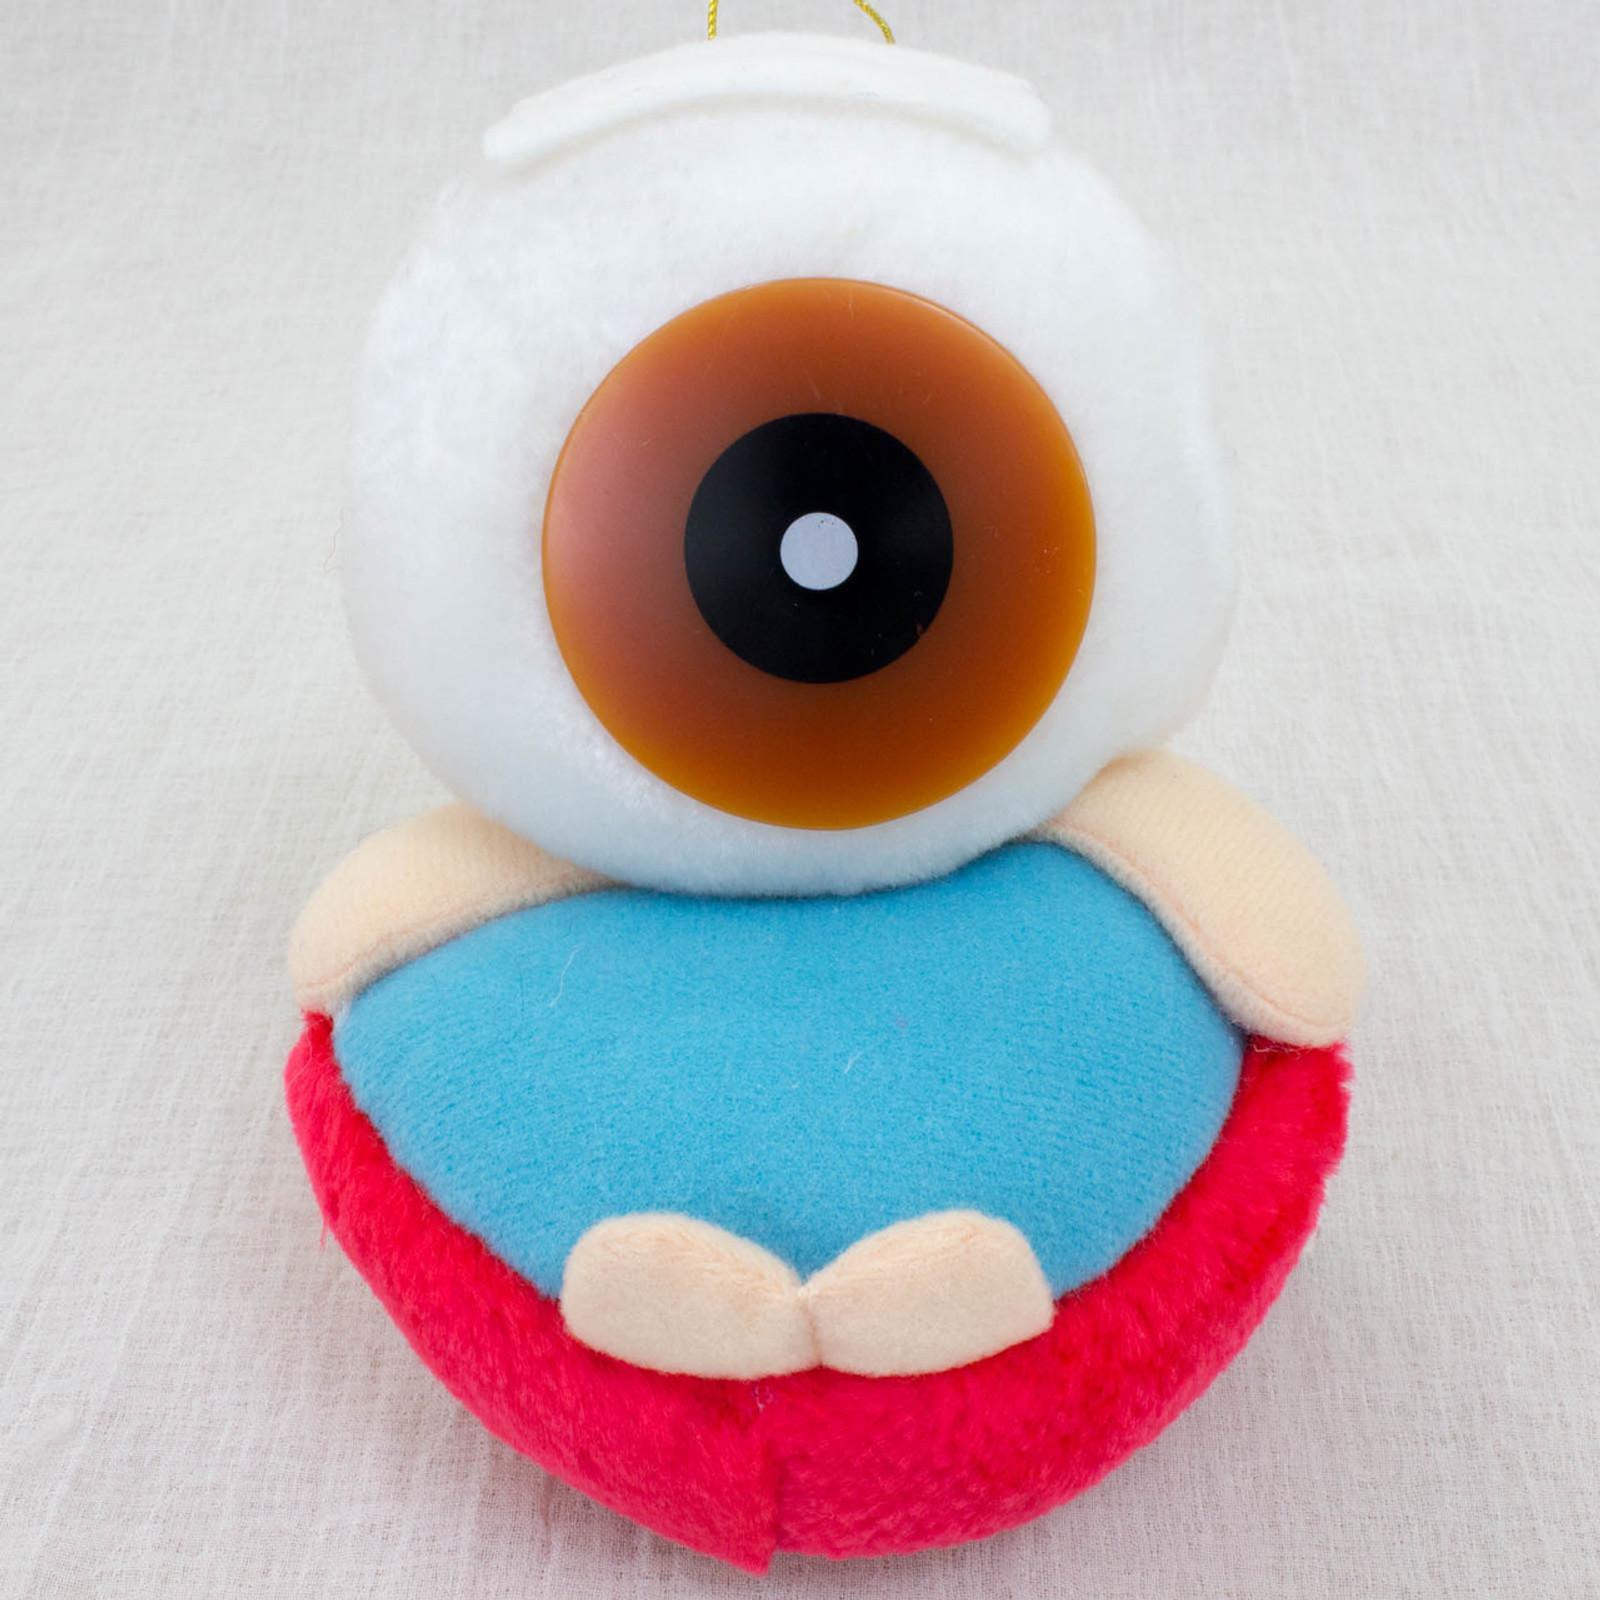 "RARE! Gegege no Kitaro Medama Oyaji 4.5"" Plush Doll JAPAN ANIME YOKAI"